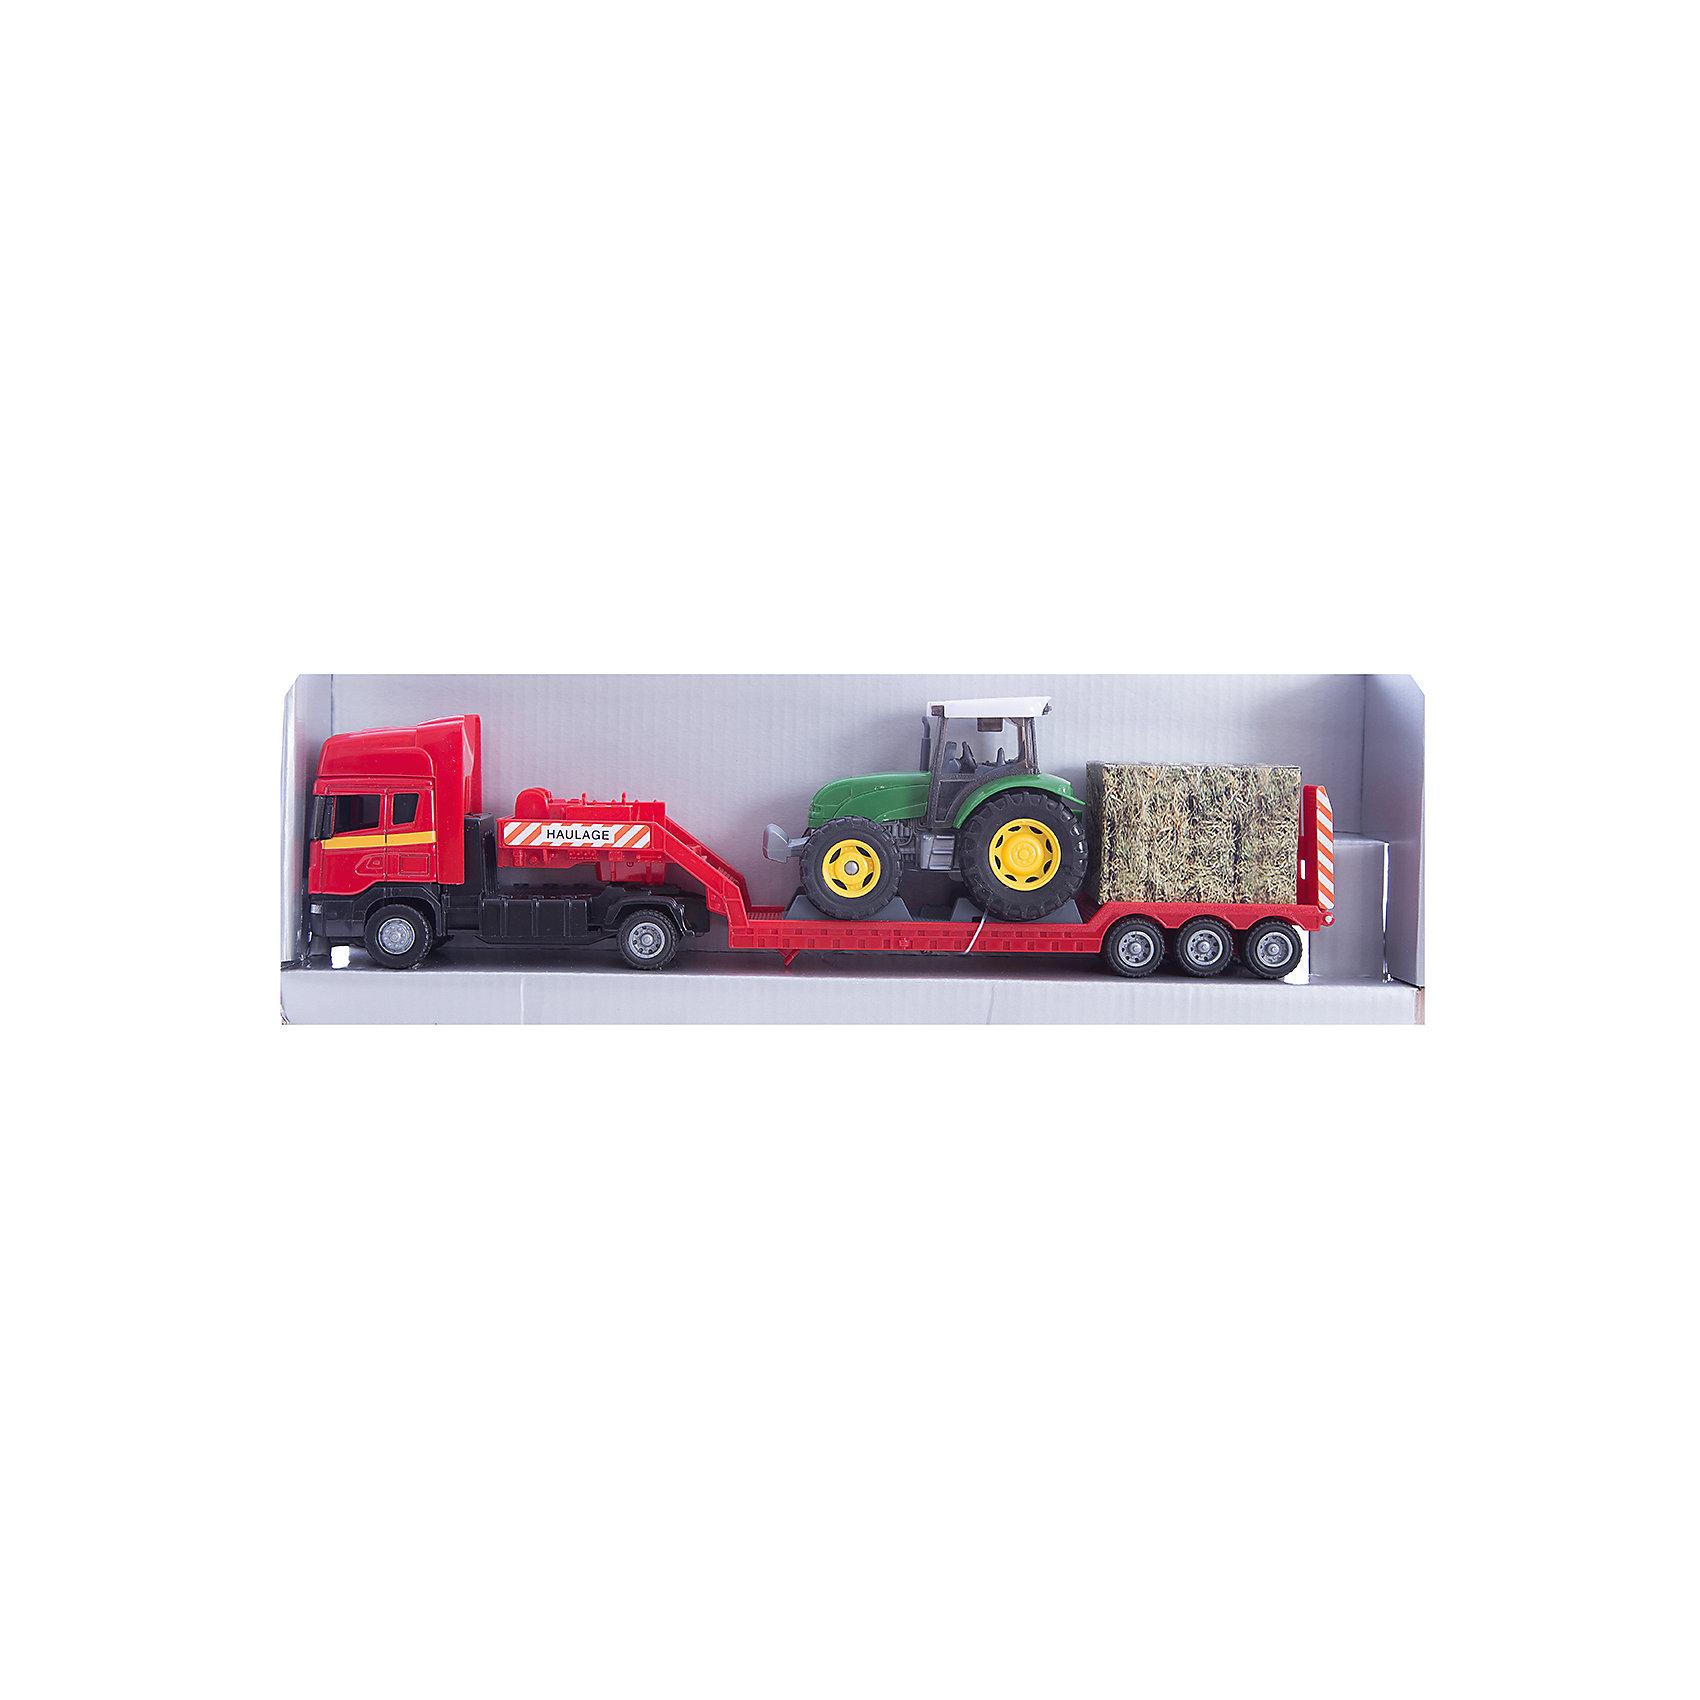 Машинка Scania с трактором 1:48, AutotimeМашинки<br><br><br>Ширина мм: 362<br>Глубина мм: 114<br>Высота мм: 146<br>Вес г: 15<br>Возраст от месяцев: 36<br>Возраст до месяцев: 2147483647<br>Пол: Мужской<br>Возраст: Детский<br>SKU: 5584136